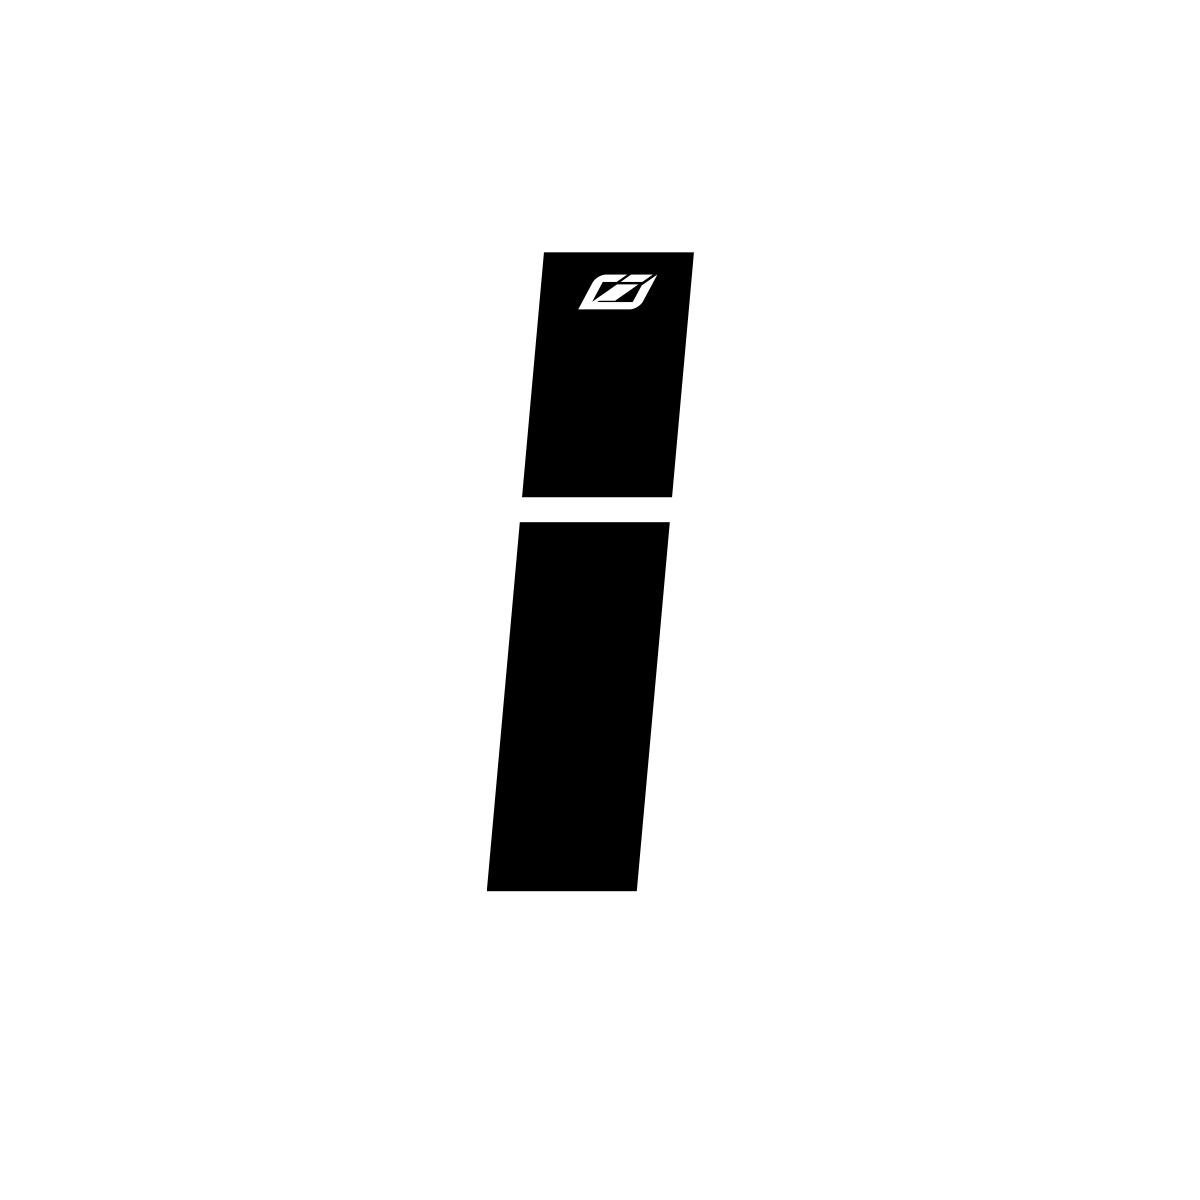 "INSIGHT LETTER STICKER BLACK 1.5"""